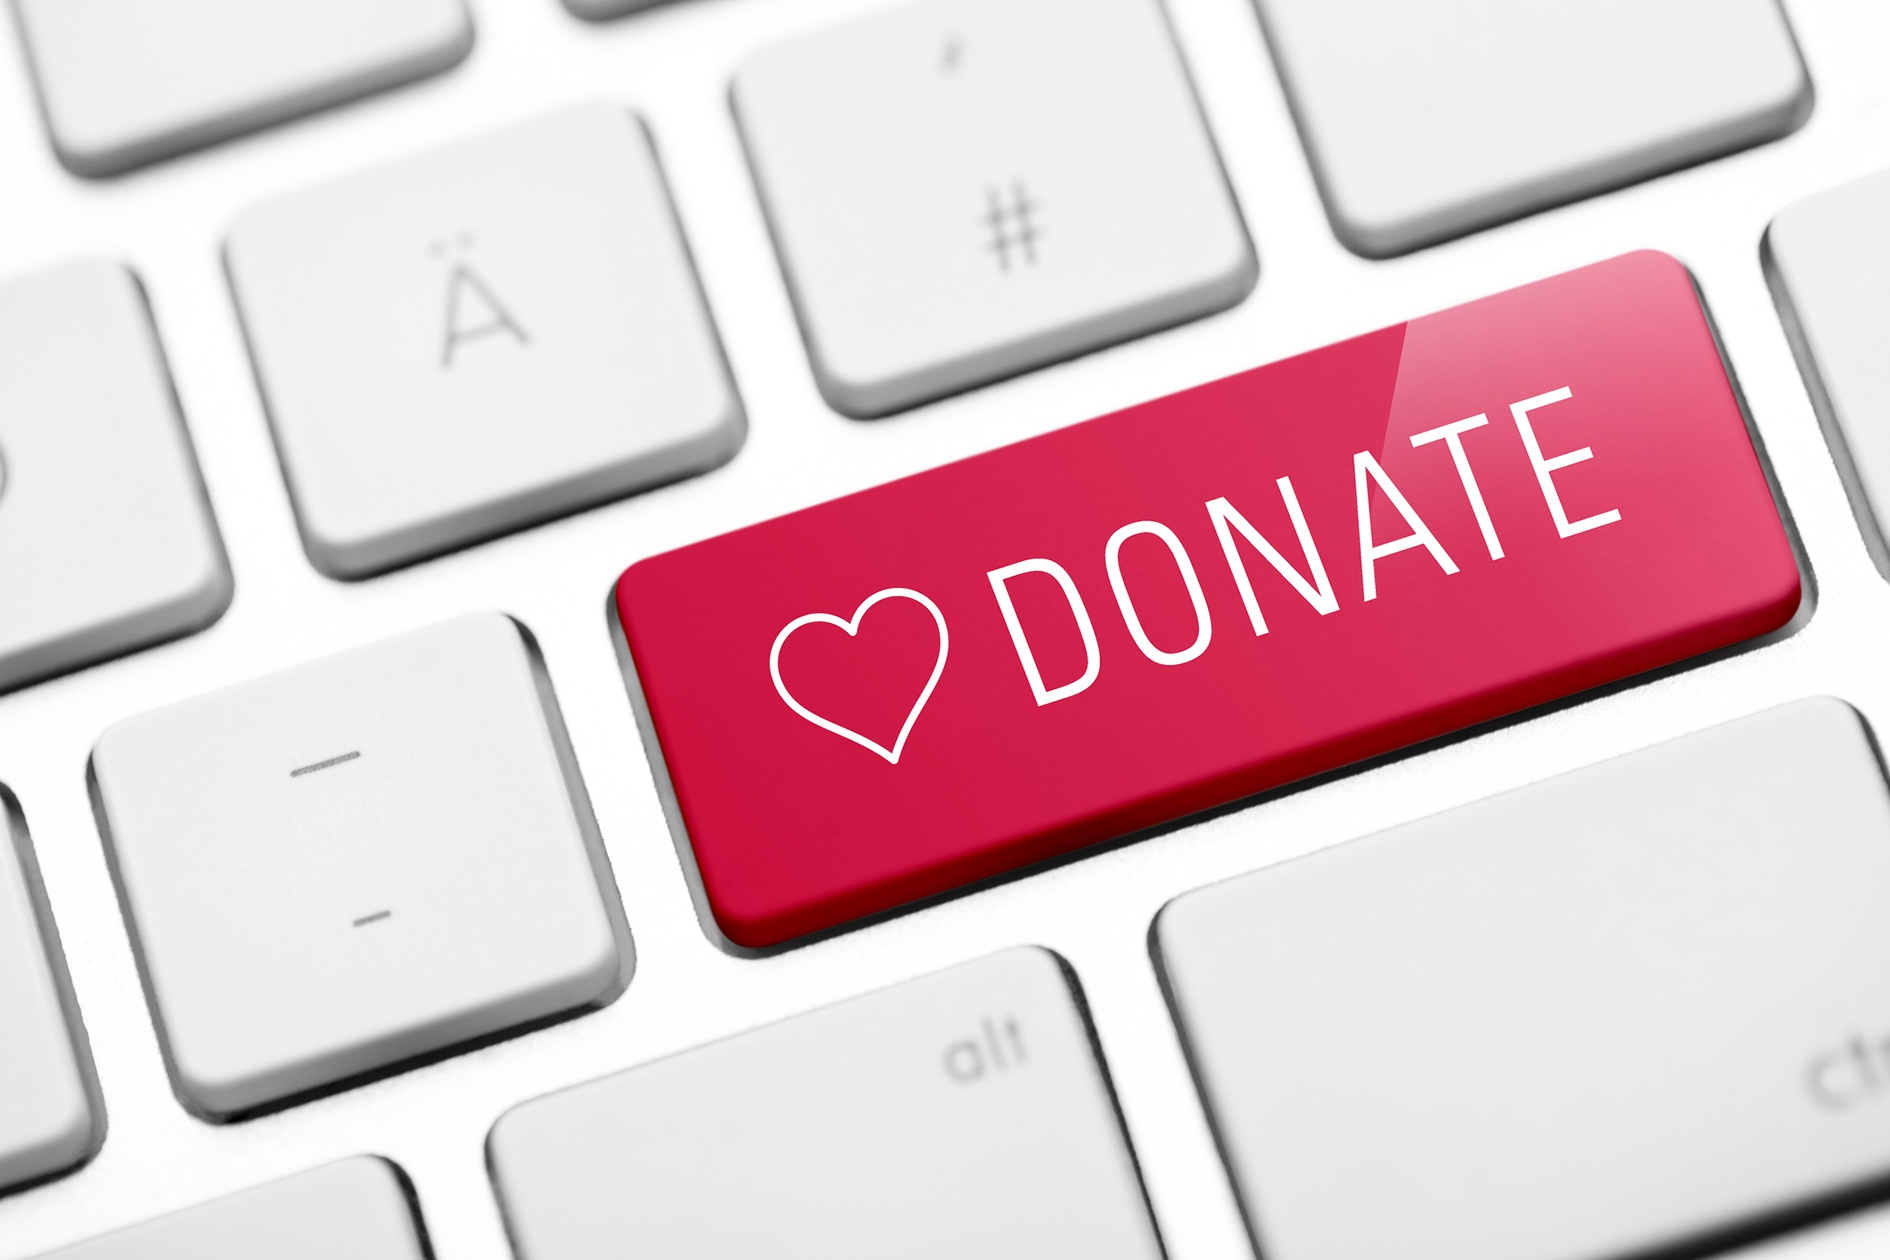 Donate on a Keyboard-1